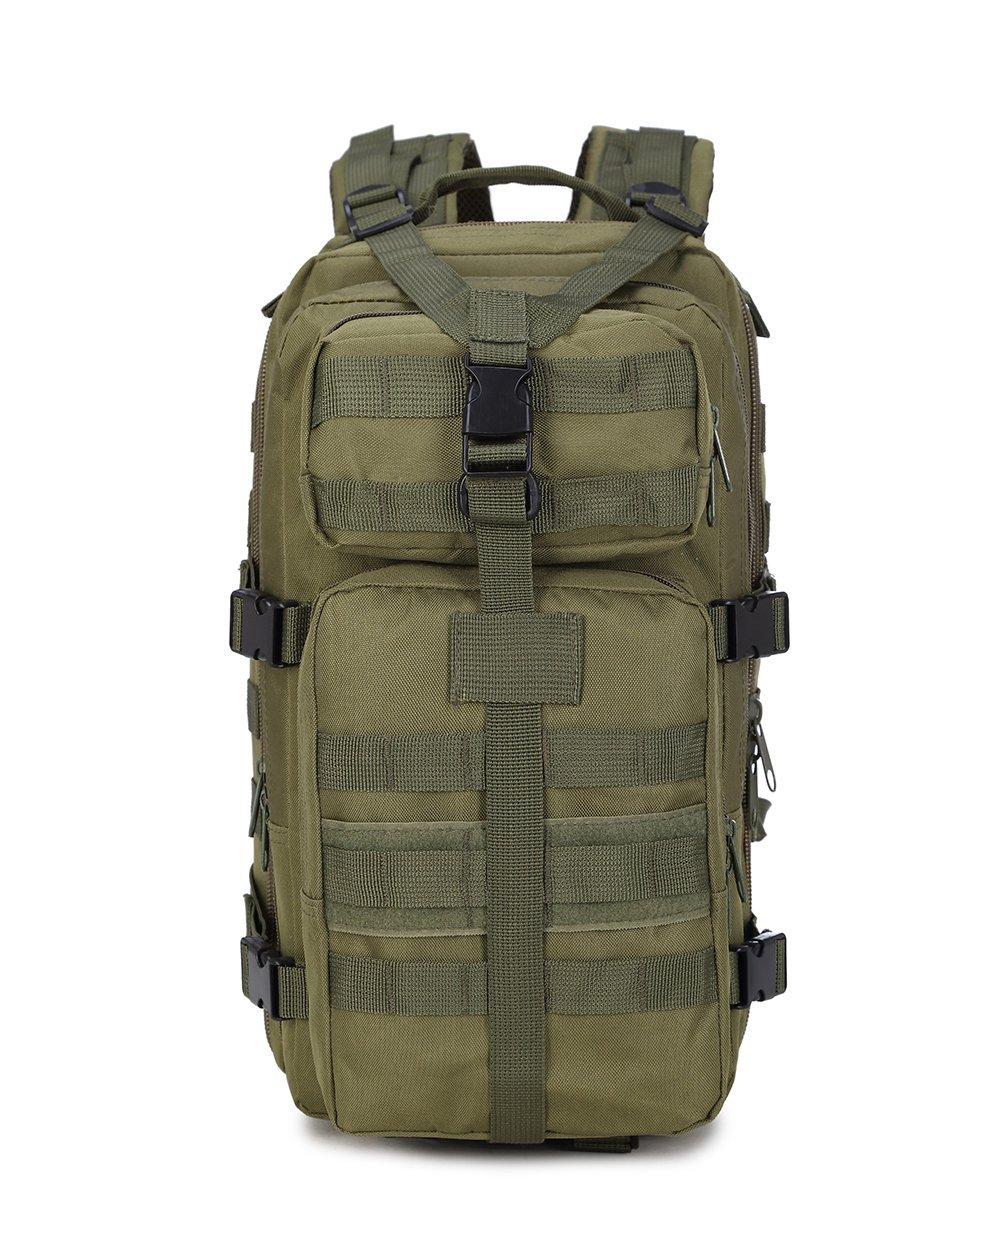 342f5019dd2d3 Gemgeny 35L Tactical Military Assault Pack Rucksack Bug Out Bag Armee MOLLE  Klein Rucksack für Outdoor Wandern Camping Trekking Jagd Rucksack